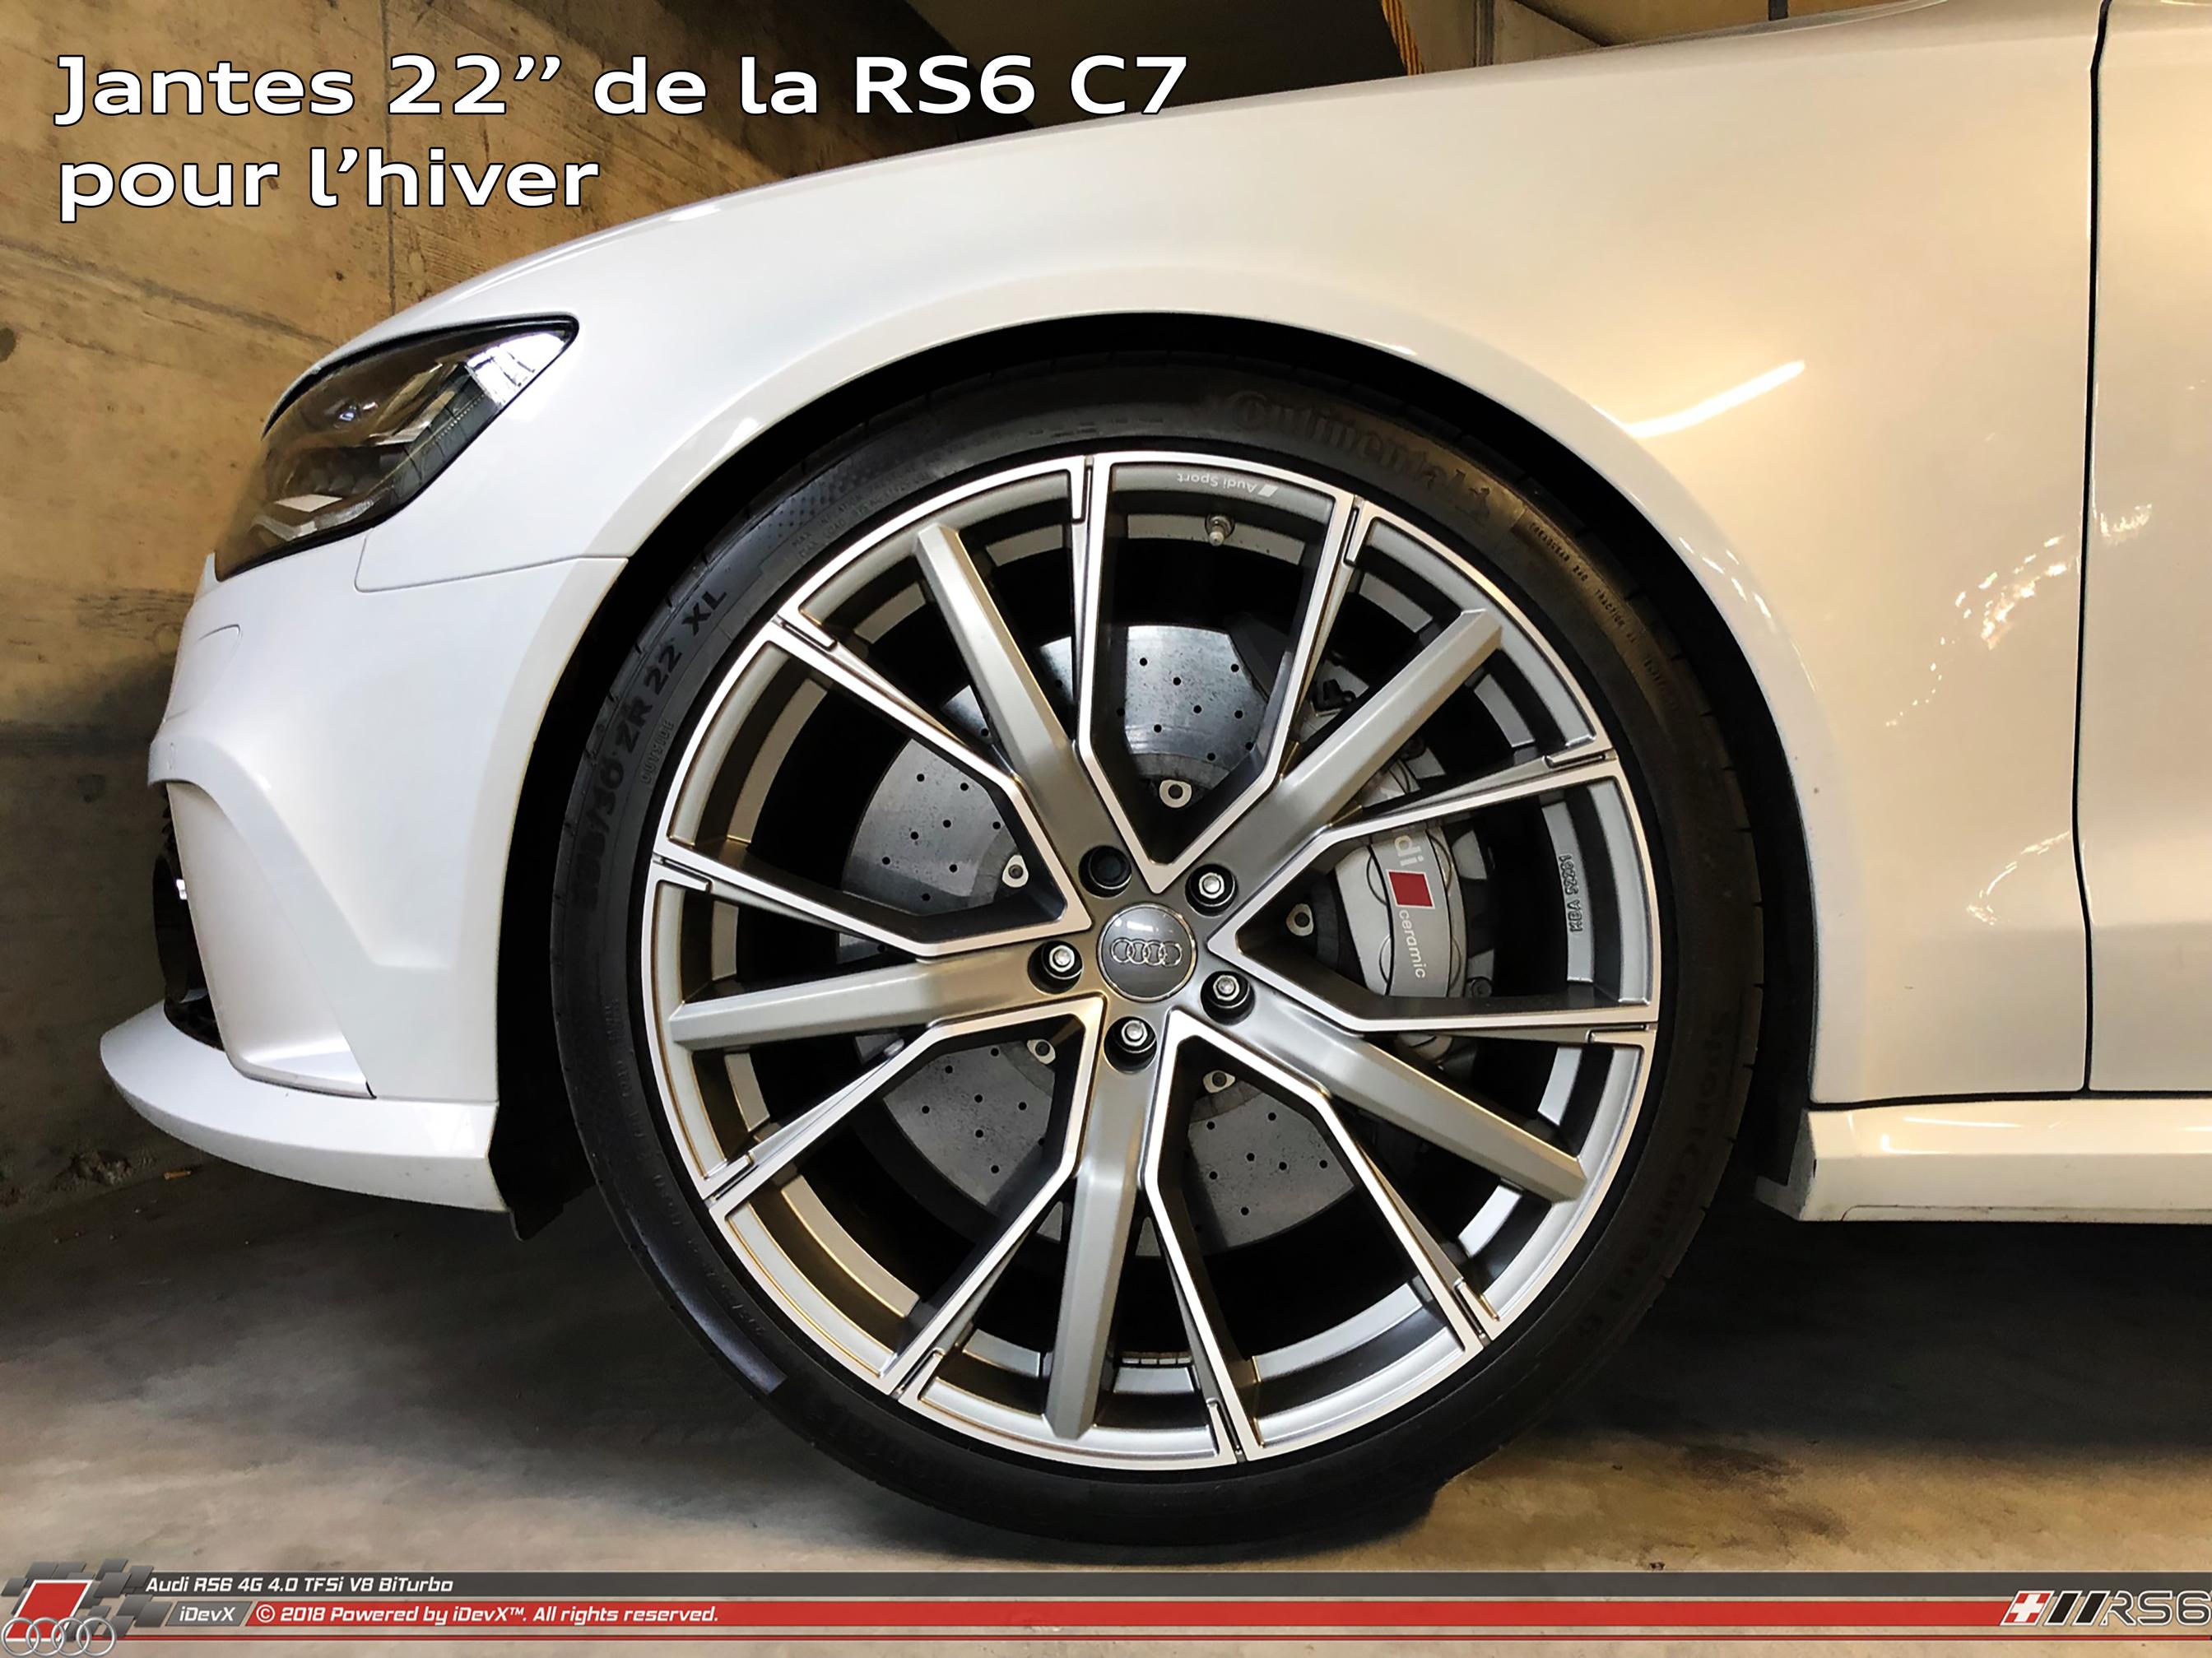 iDevX_Audi-RS6_Test_PM-JantesPERF-22inch_001.png